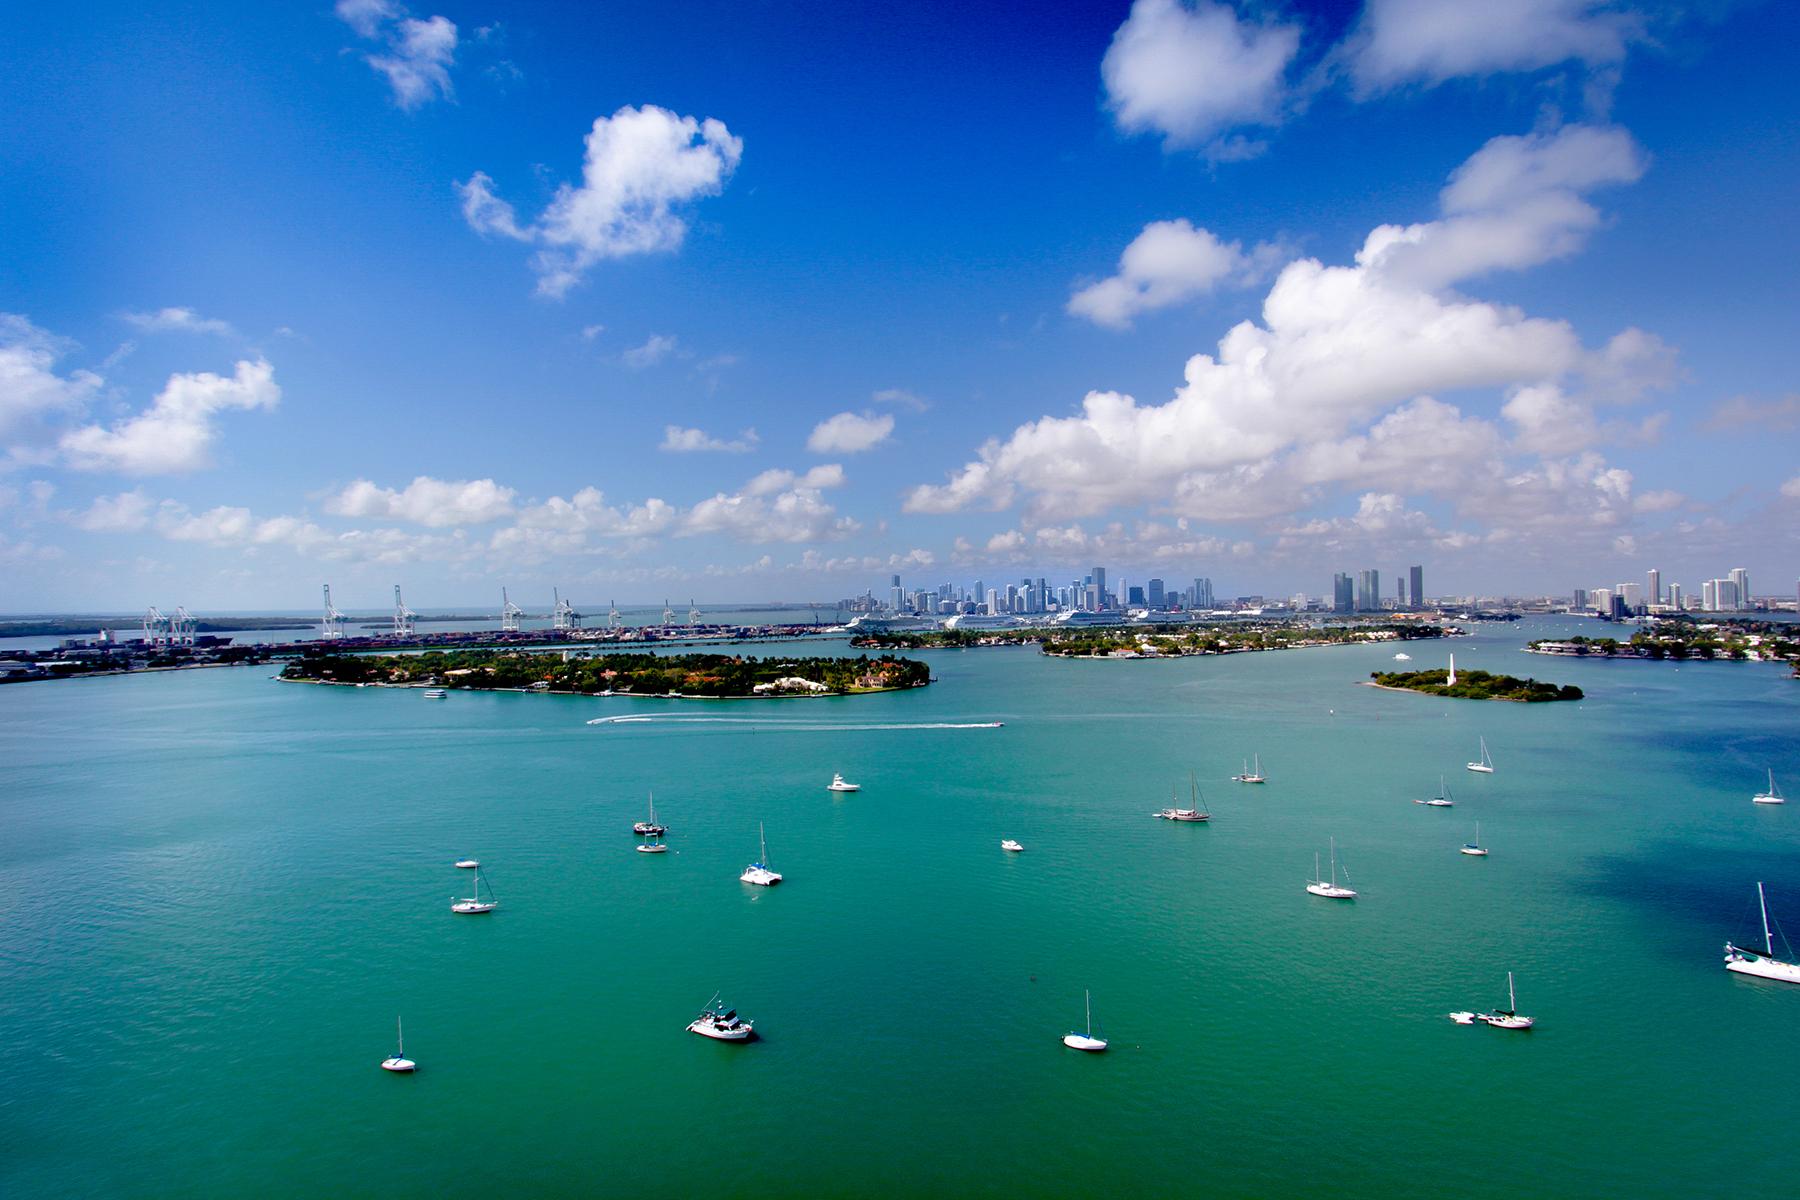 Condominium for Sale at 1330 West Ave #3001 1330 West Ave 3001 Miami Beach, Florida, 33139 United States